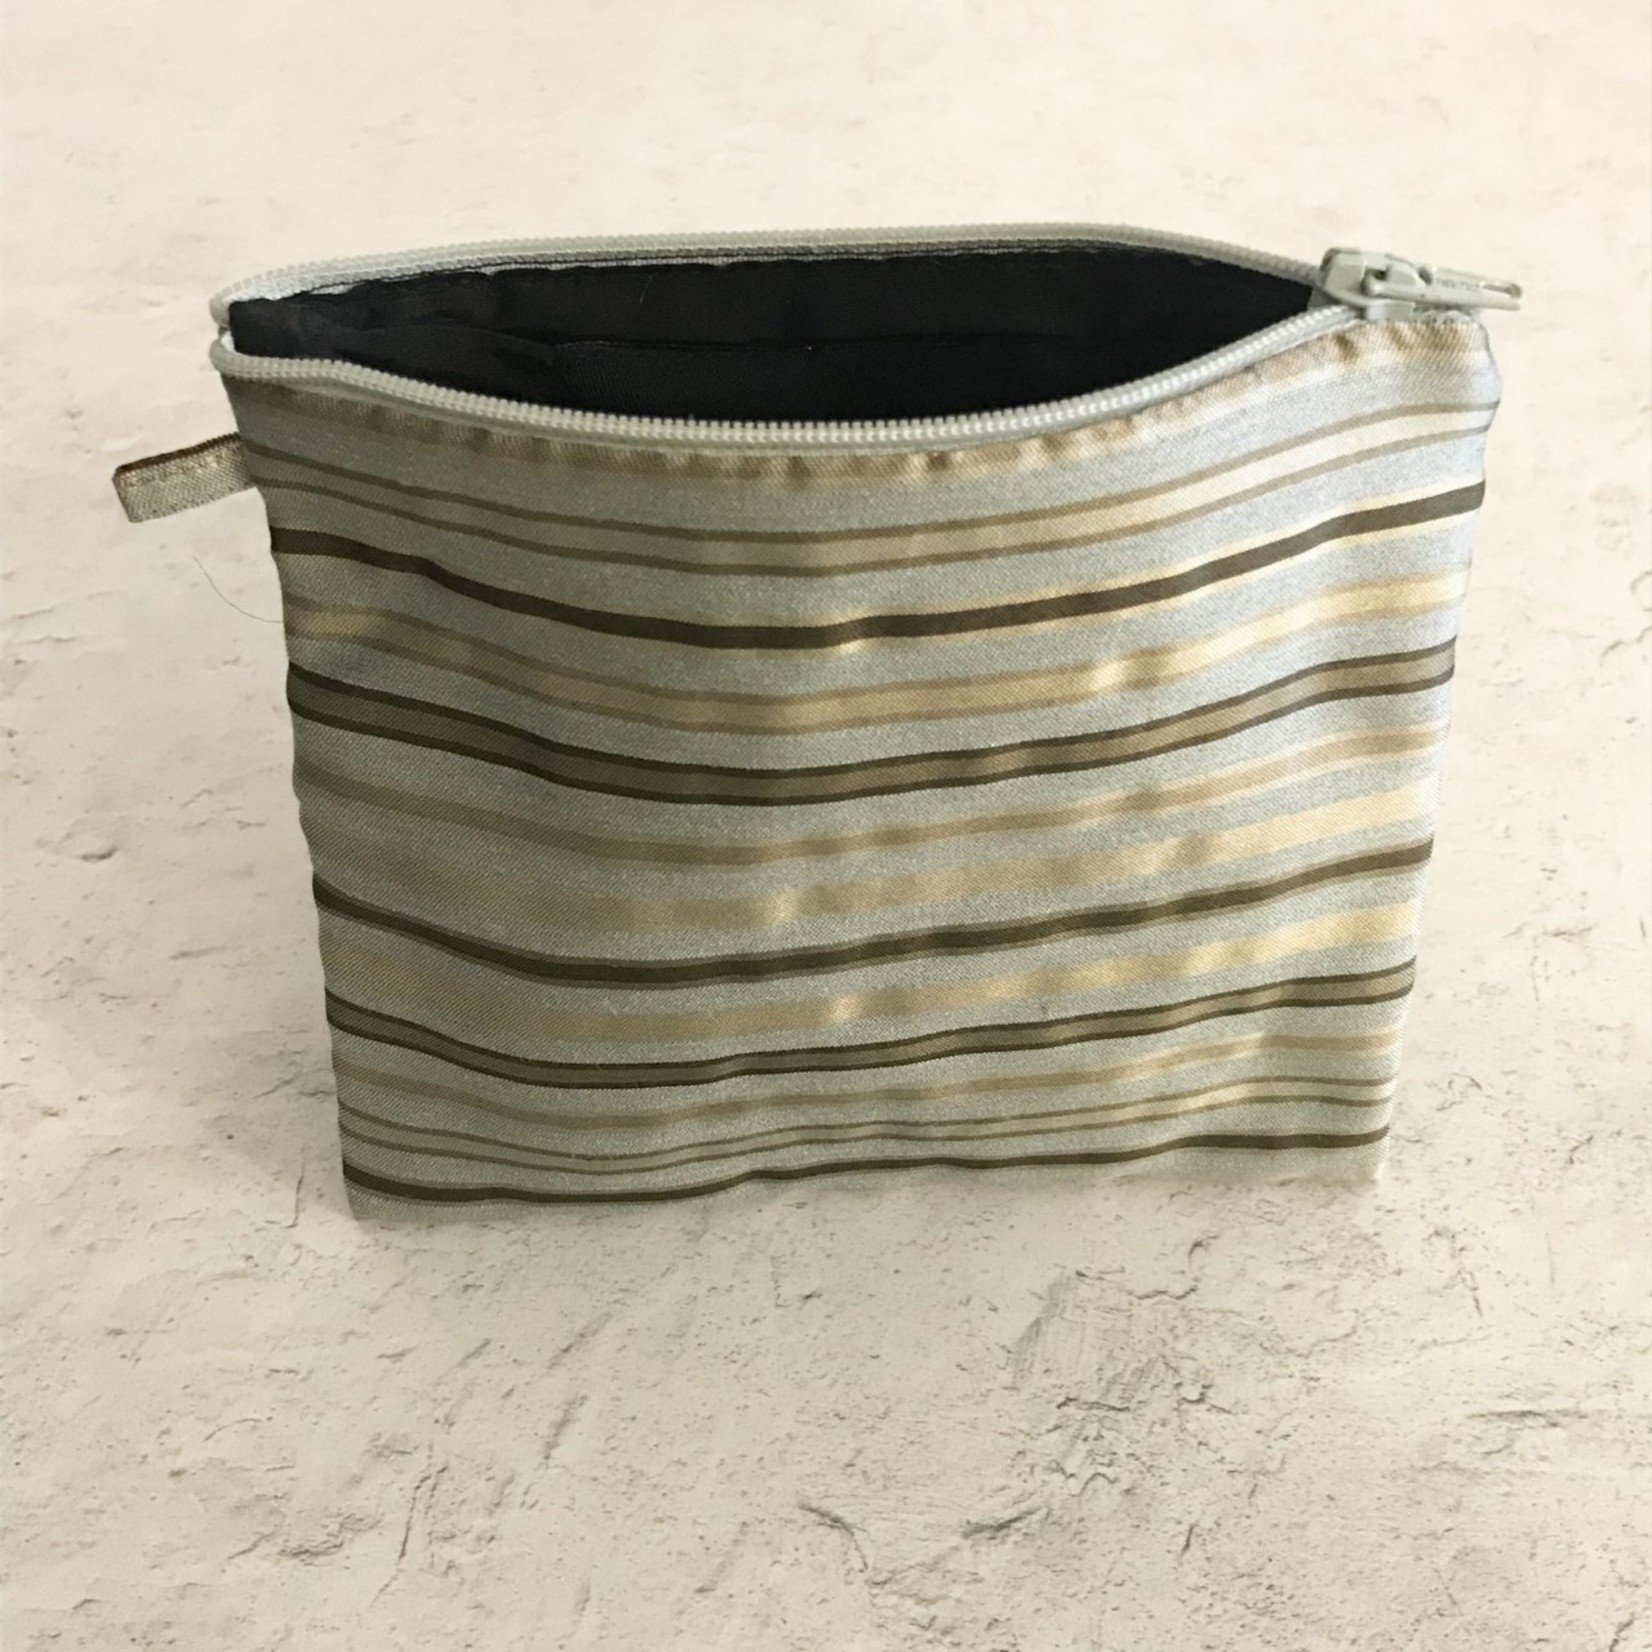 Himatsingka Himatsingka Pouch - Small-  Pale Blue and Gold Stripes